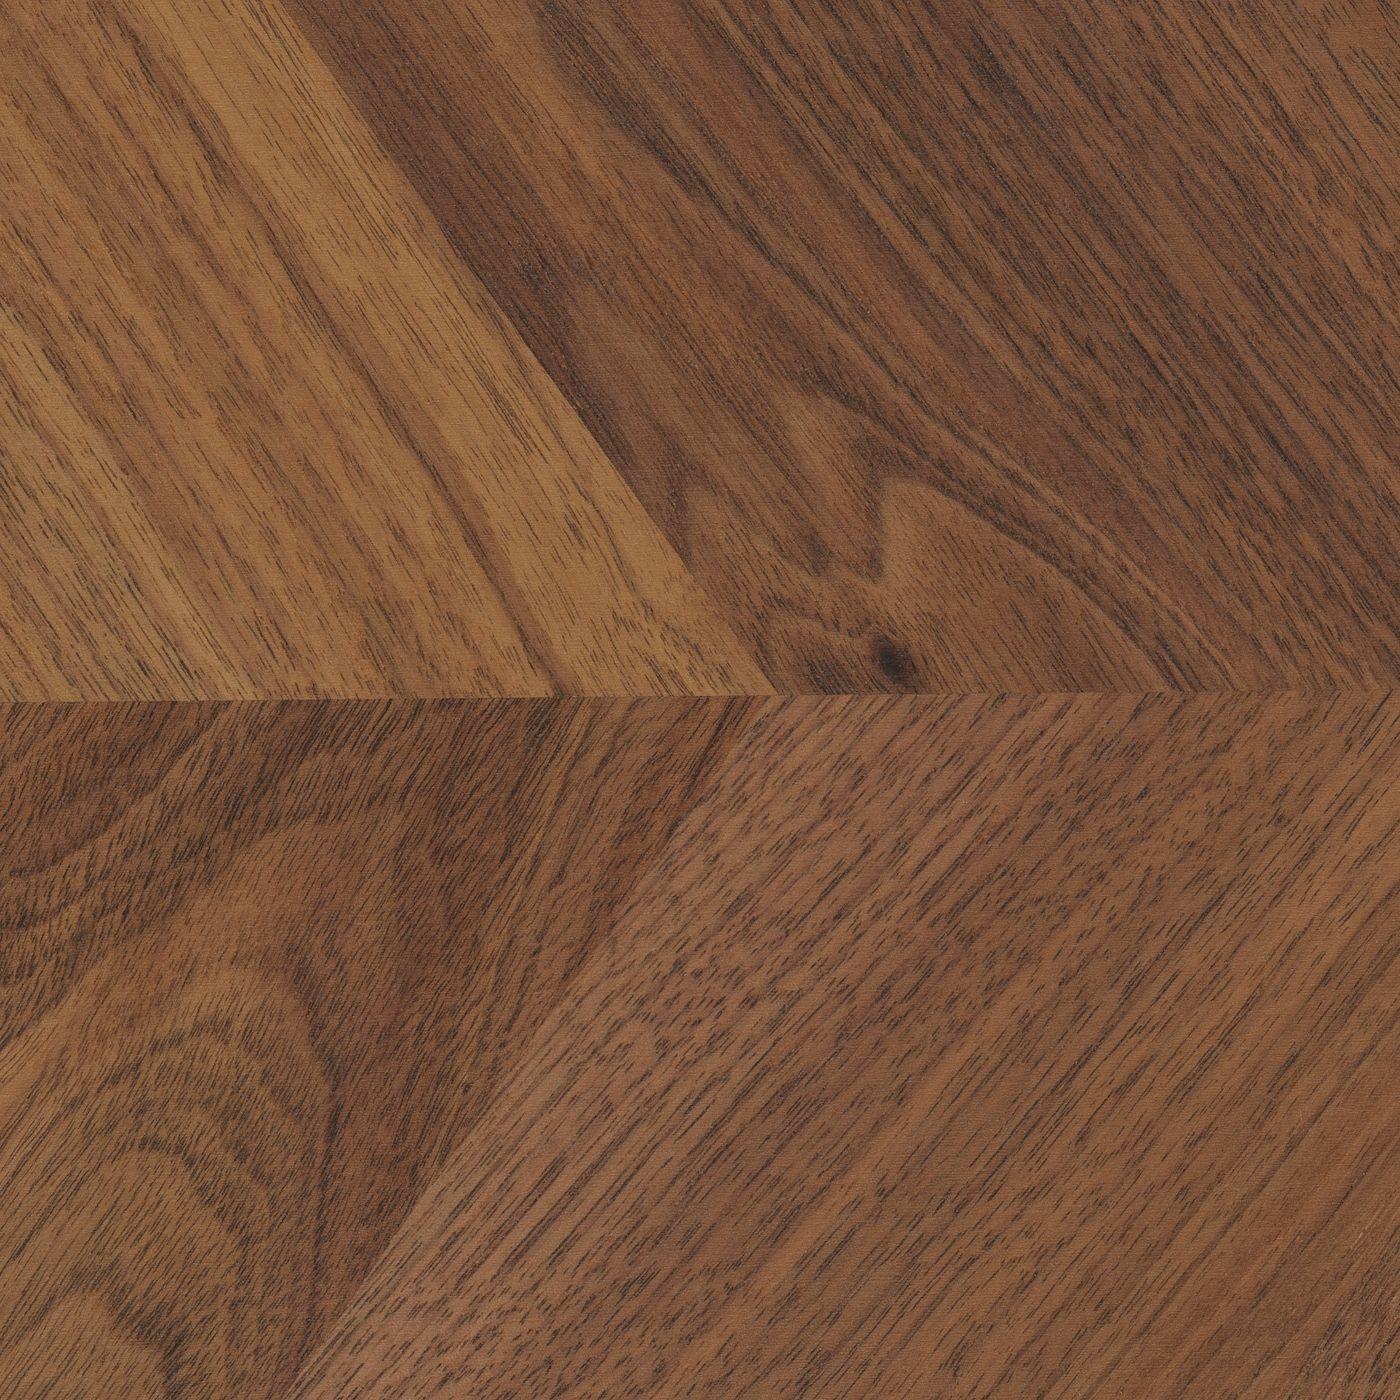 Barkaboda Countertop Walnut Veneer 74x1 1 2 188x3 8 Cm In 2020 Arbeitsplatte Furnier Ikea Produkte